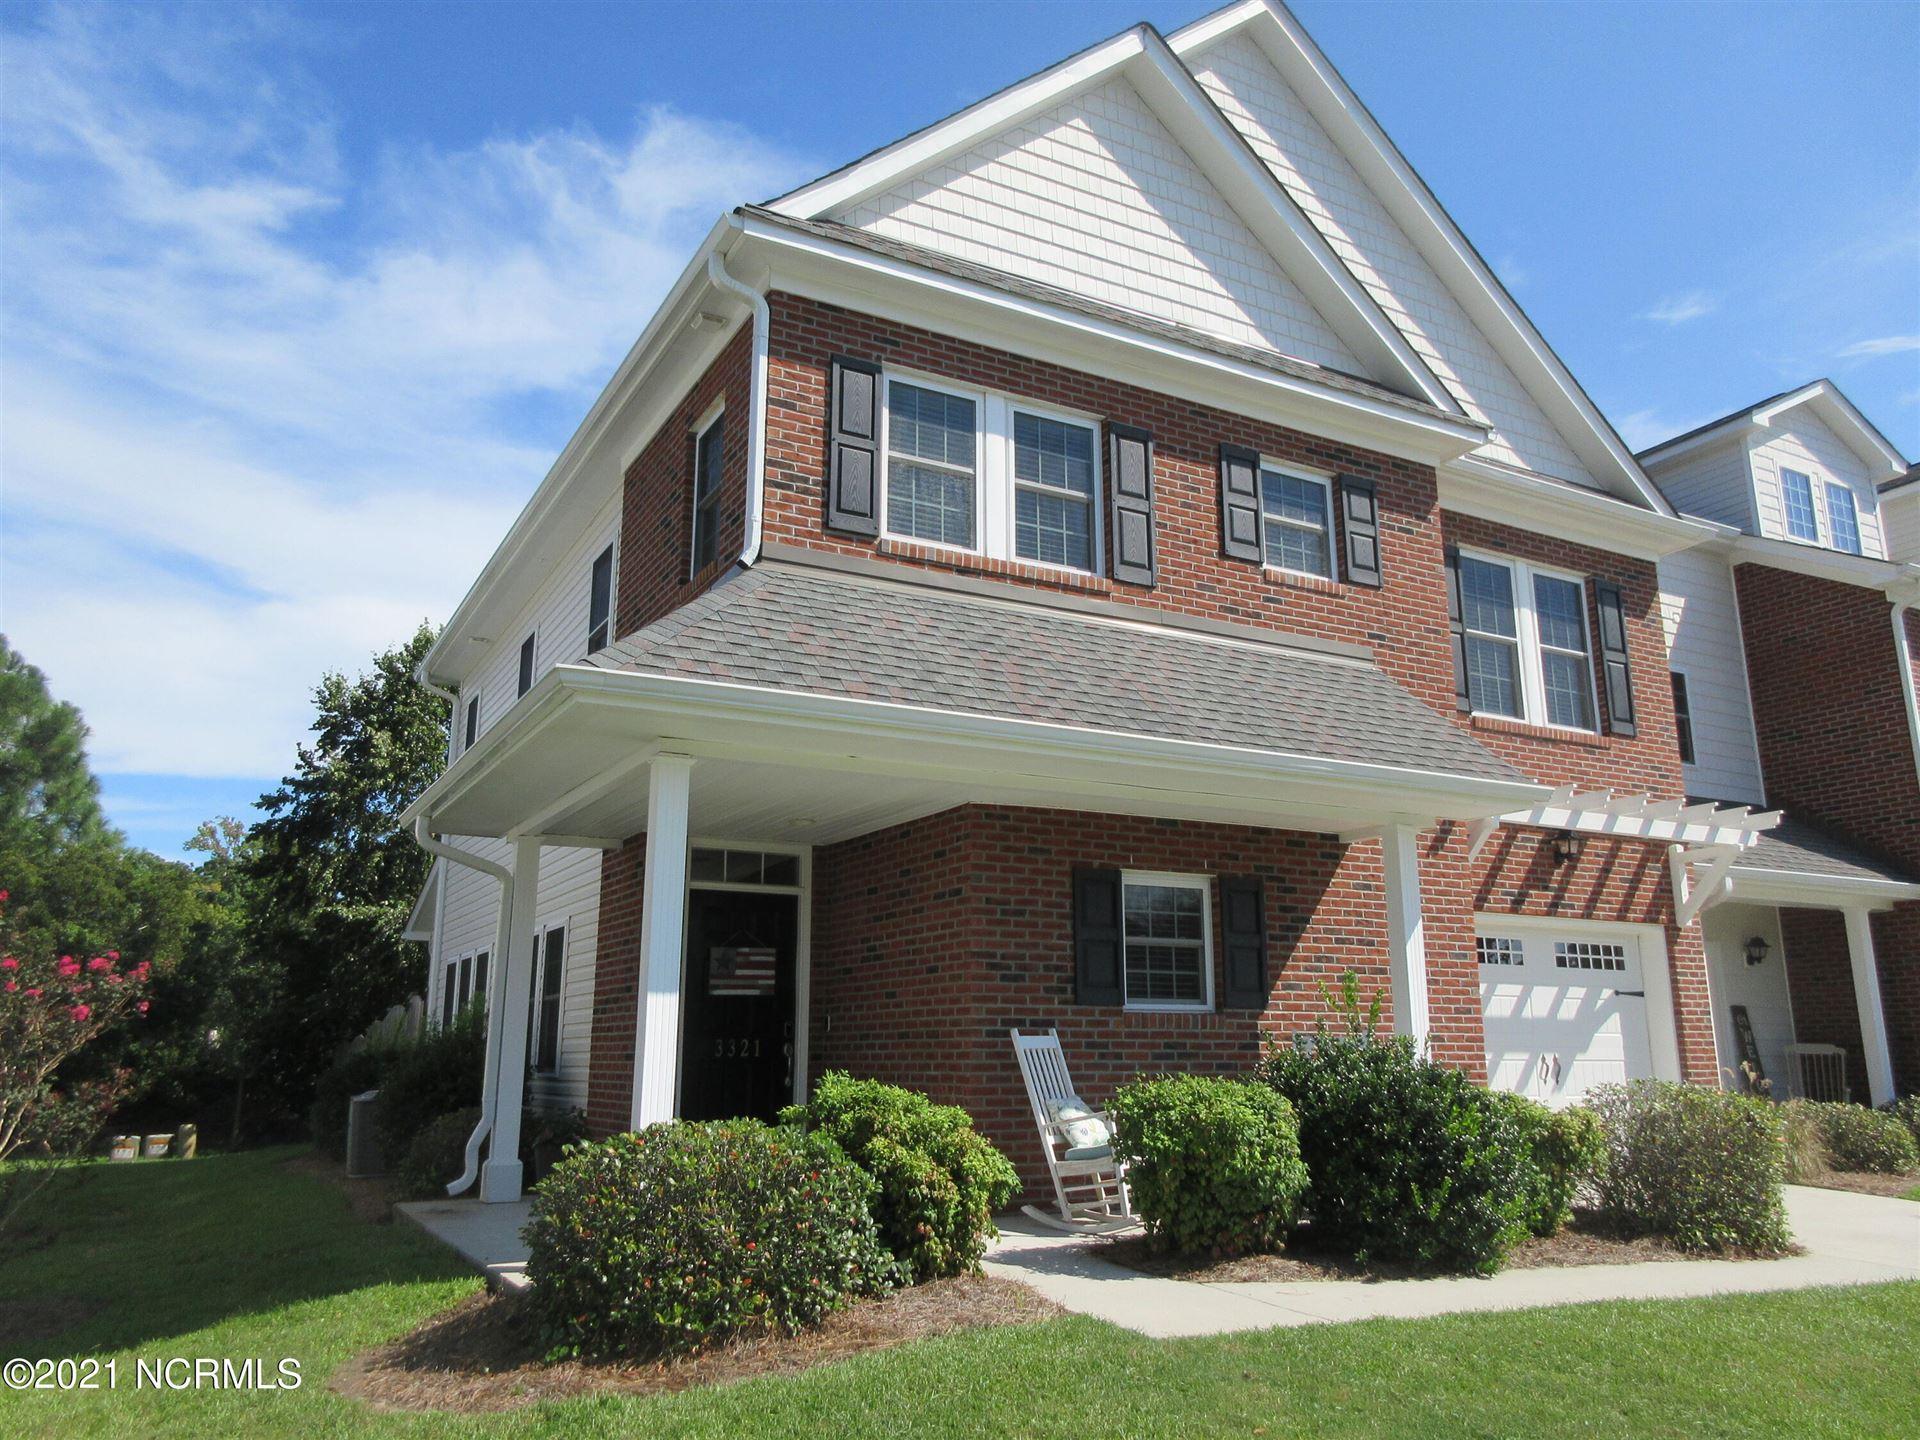 Photo of 3321 Jasper Place, Wilmington, NC 28409 (MLS # 100288077)